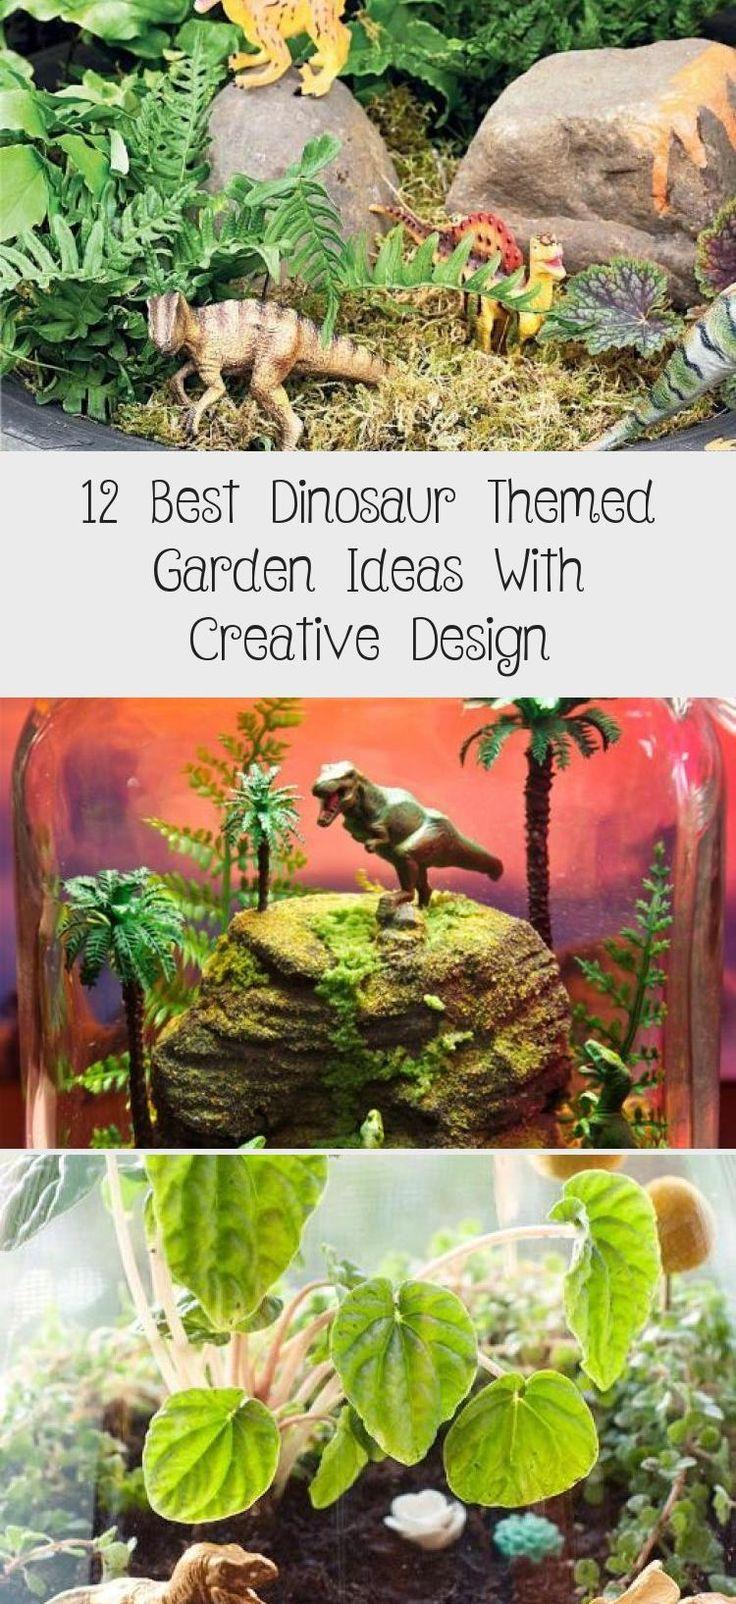 12 Best Dinosaur Themed Garden Ideas With Creative Design